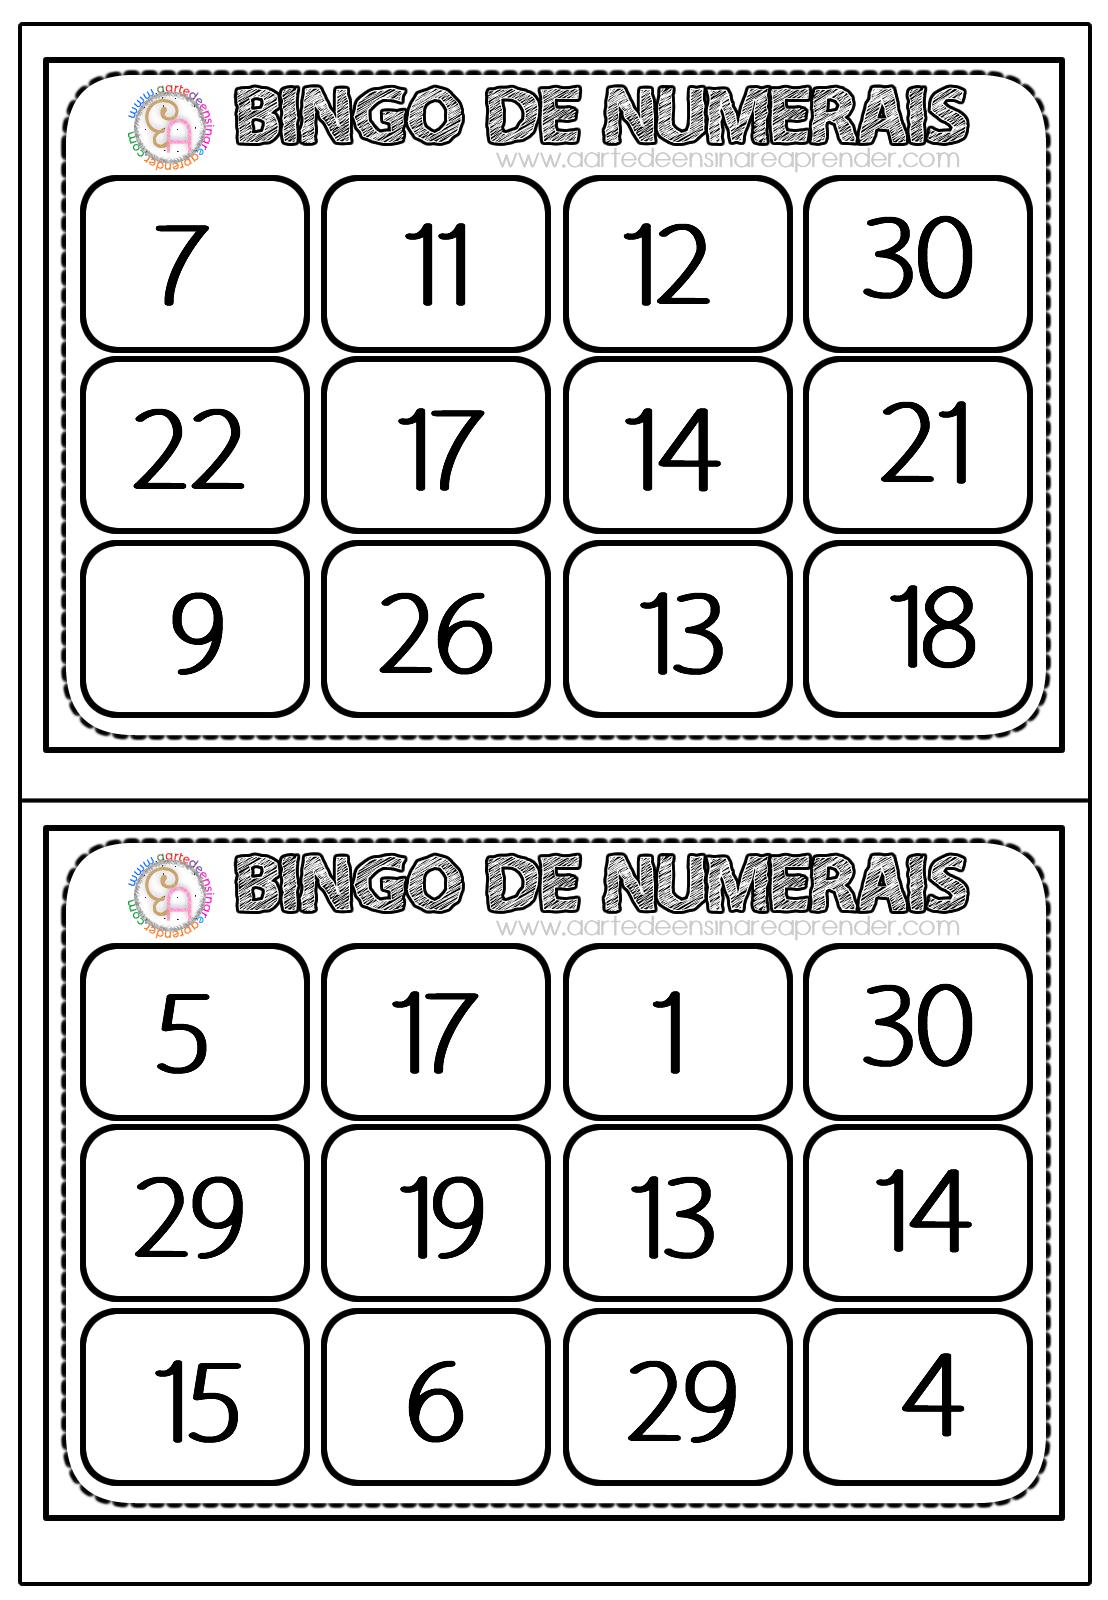 Bingo De Numerais A Arte De Ensinar E Aprender